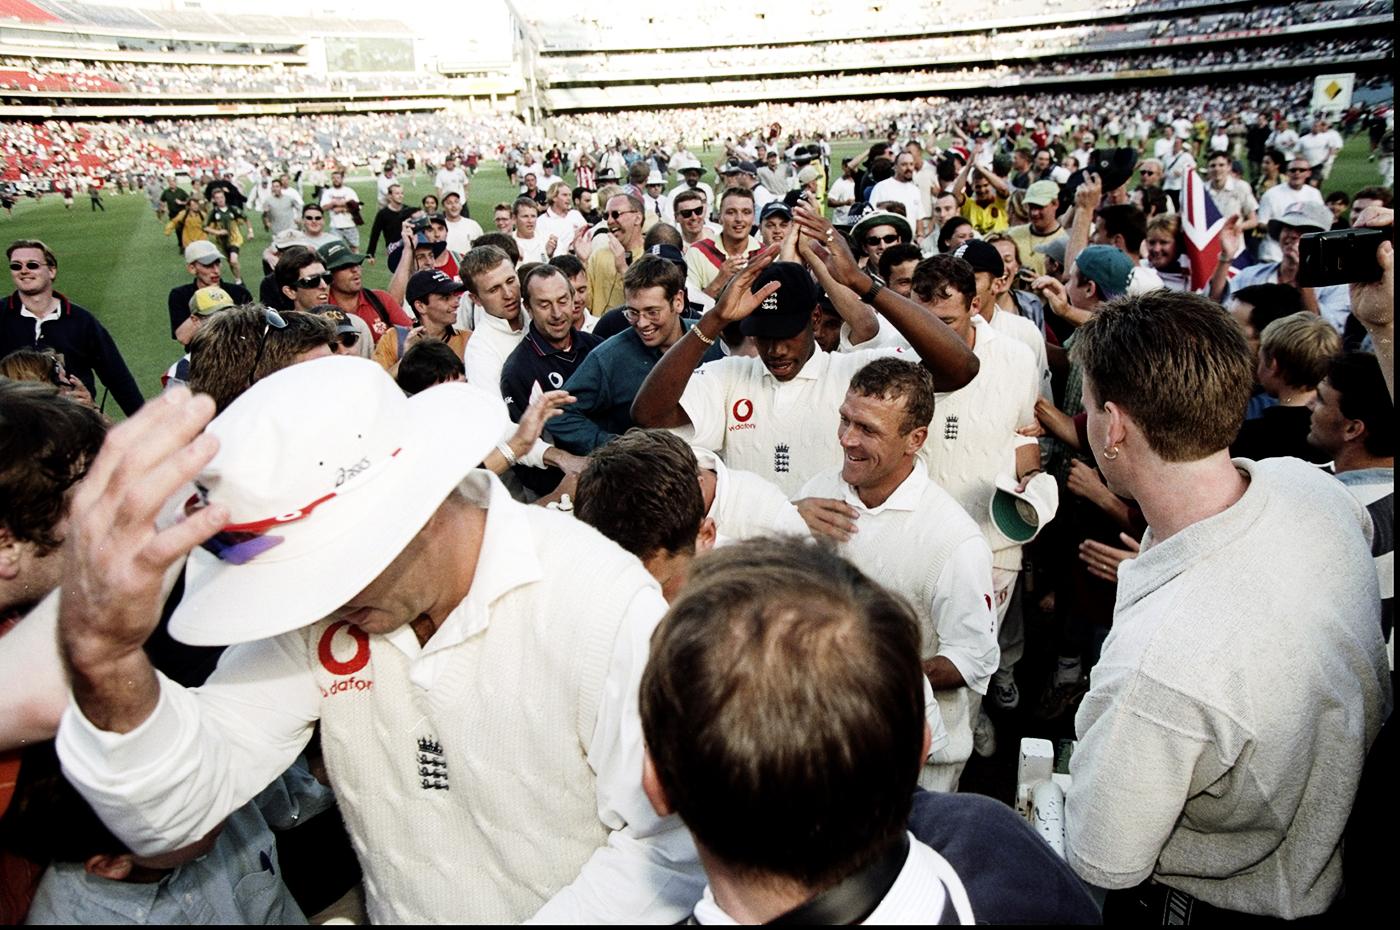 England walk back through celebrating fans